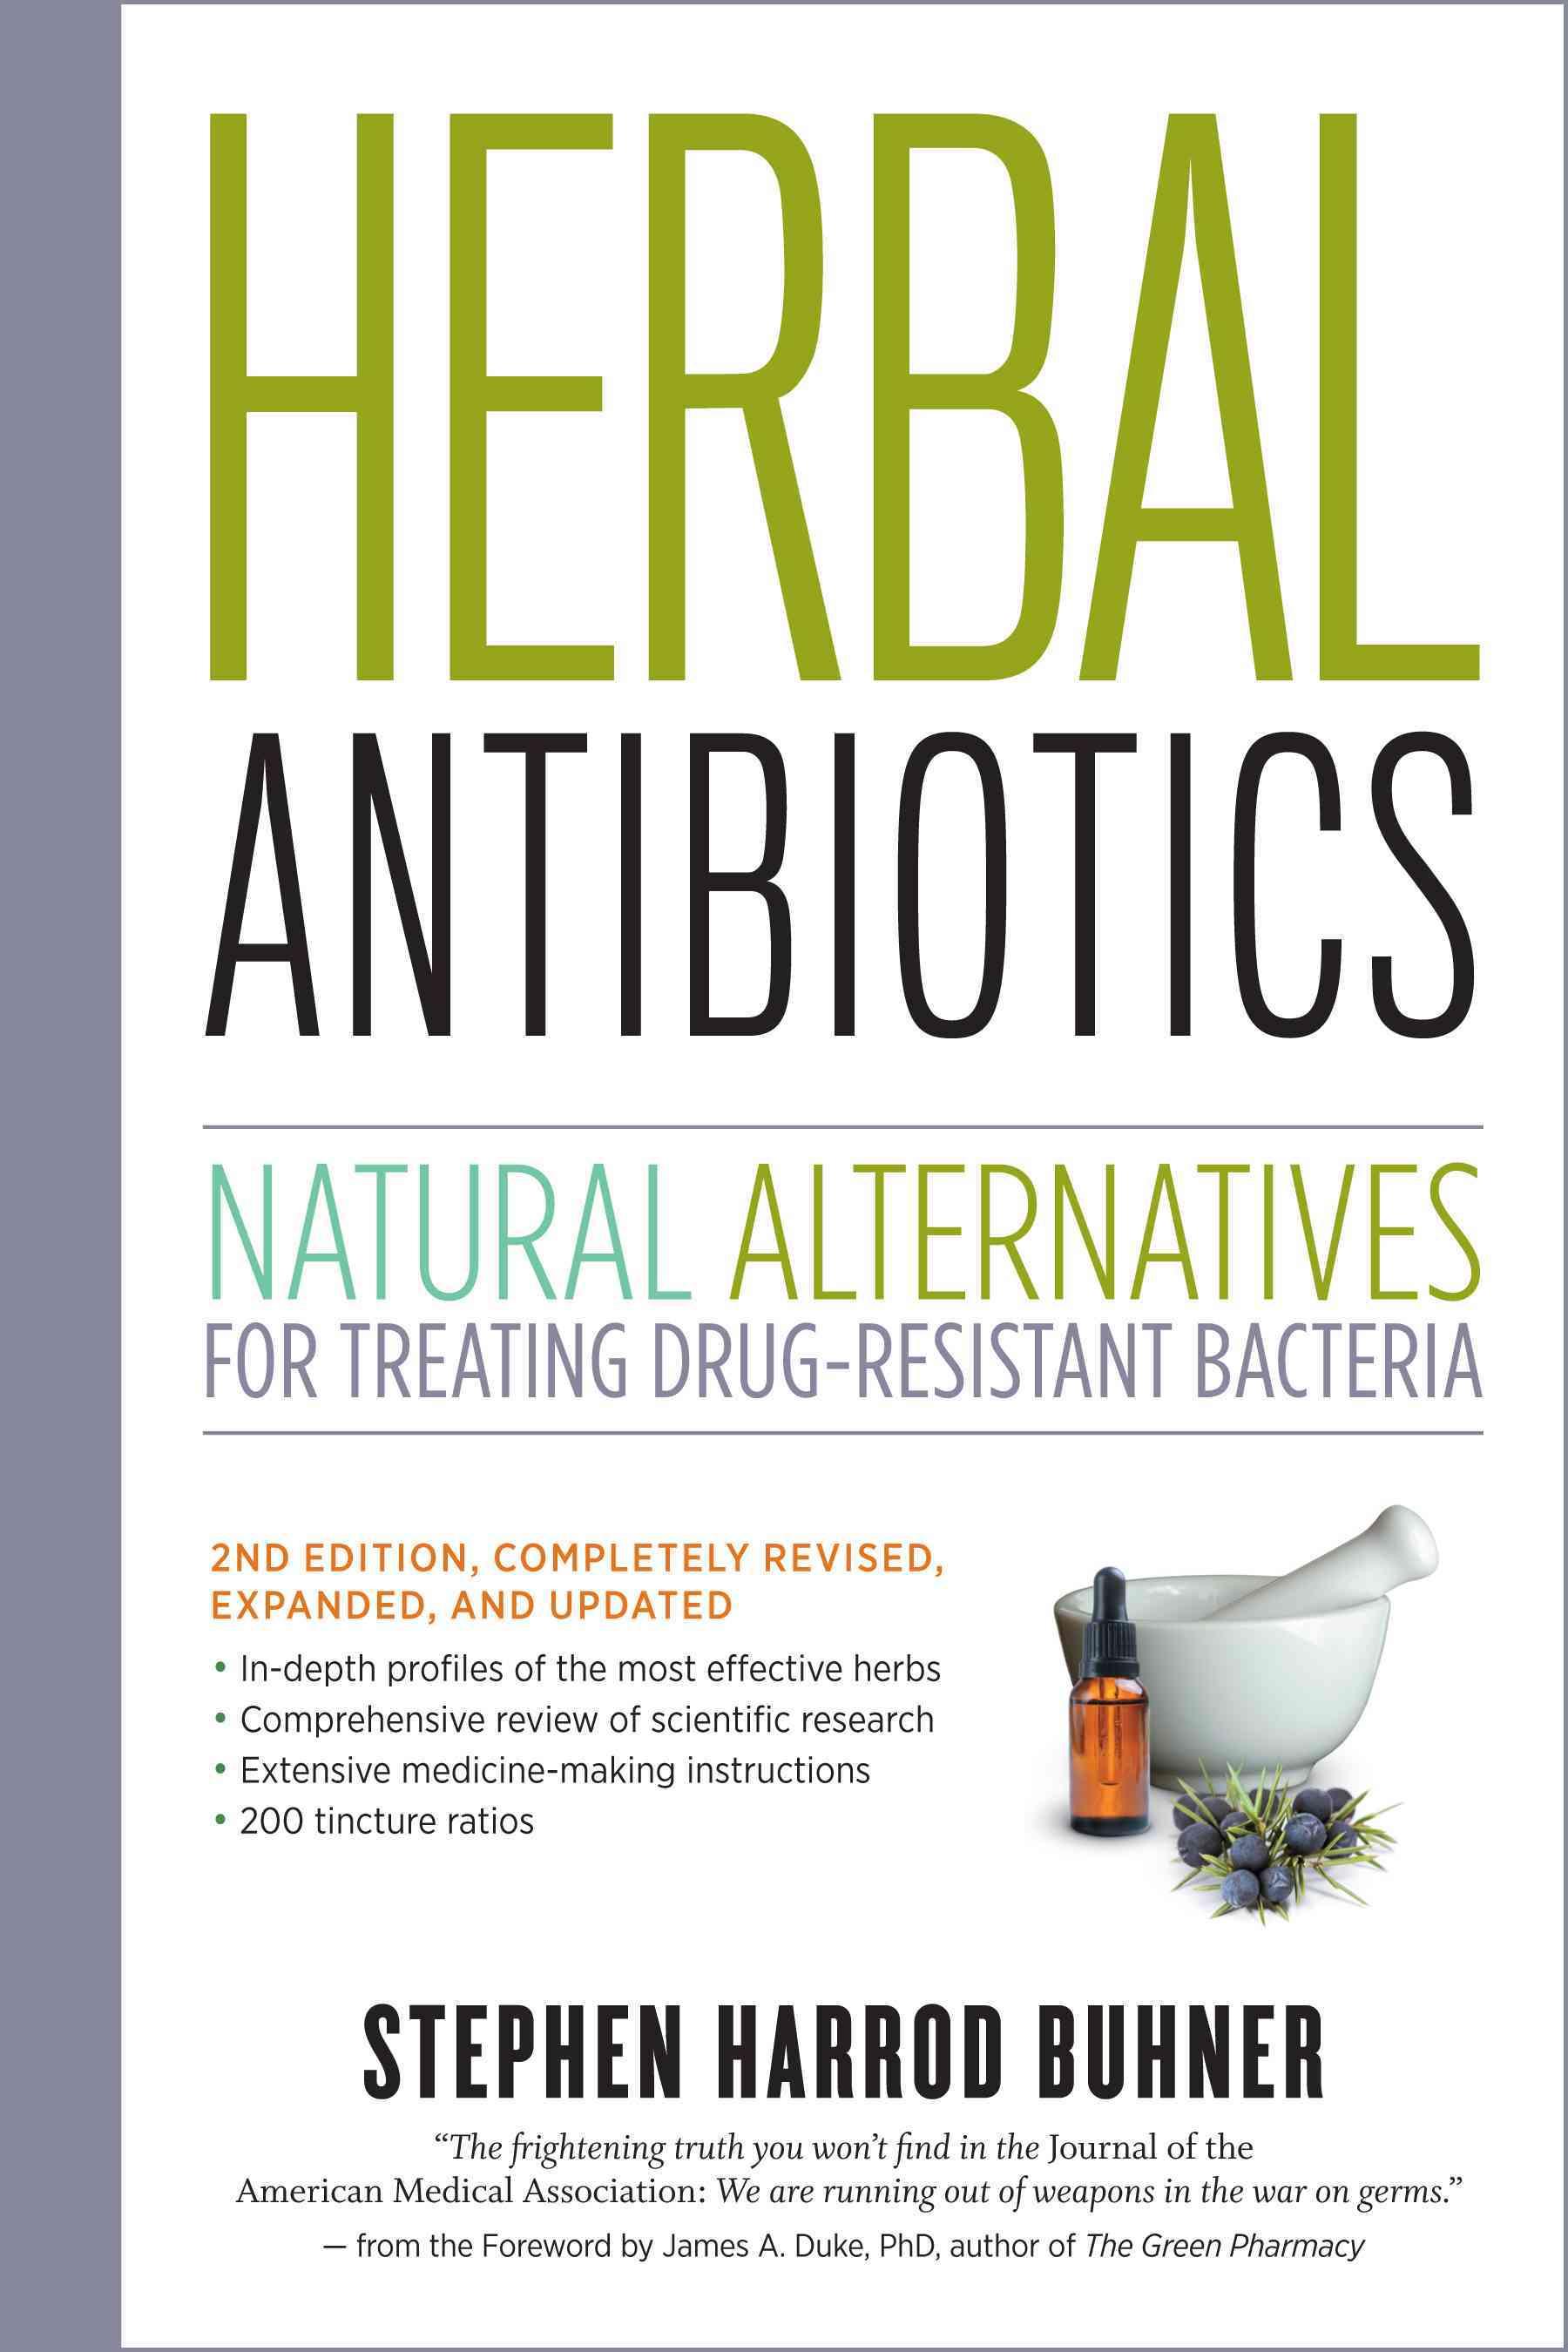 Herbal Antibiotics: Natural Alternatives for Treating Drug-Resistant Bacteria (Paperback)